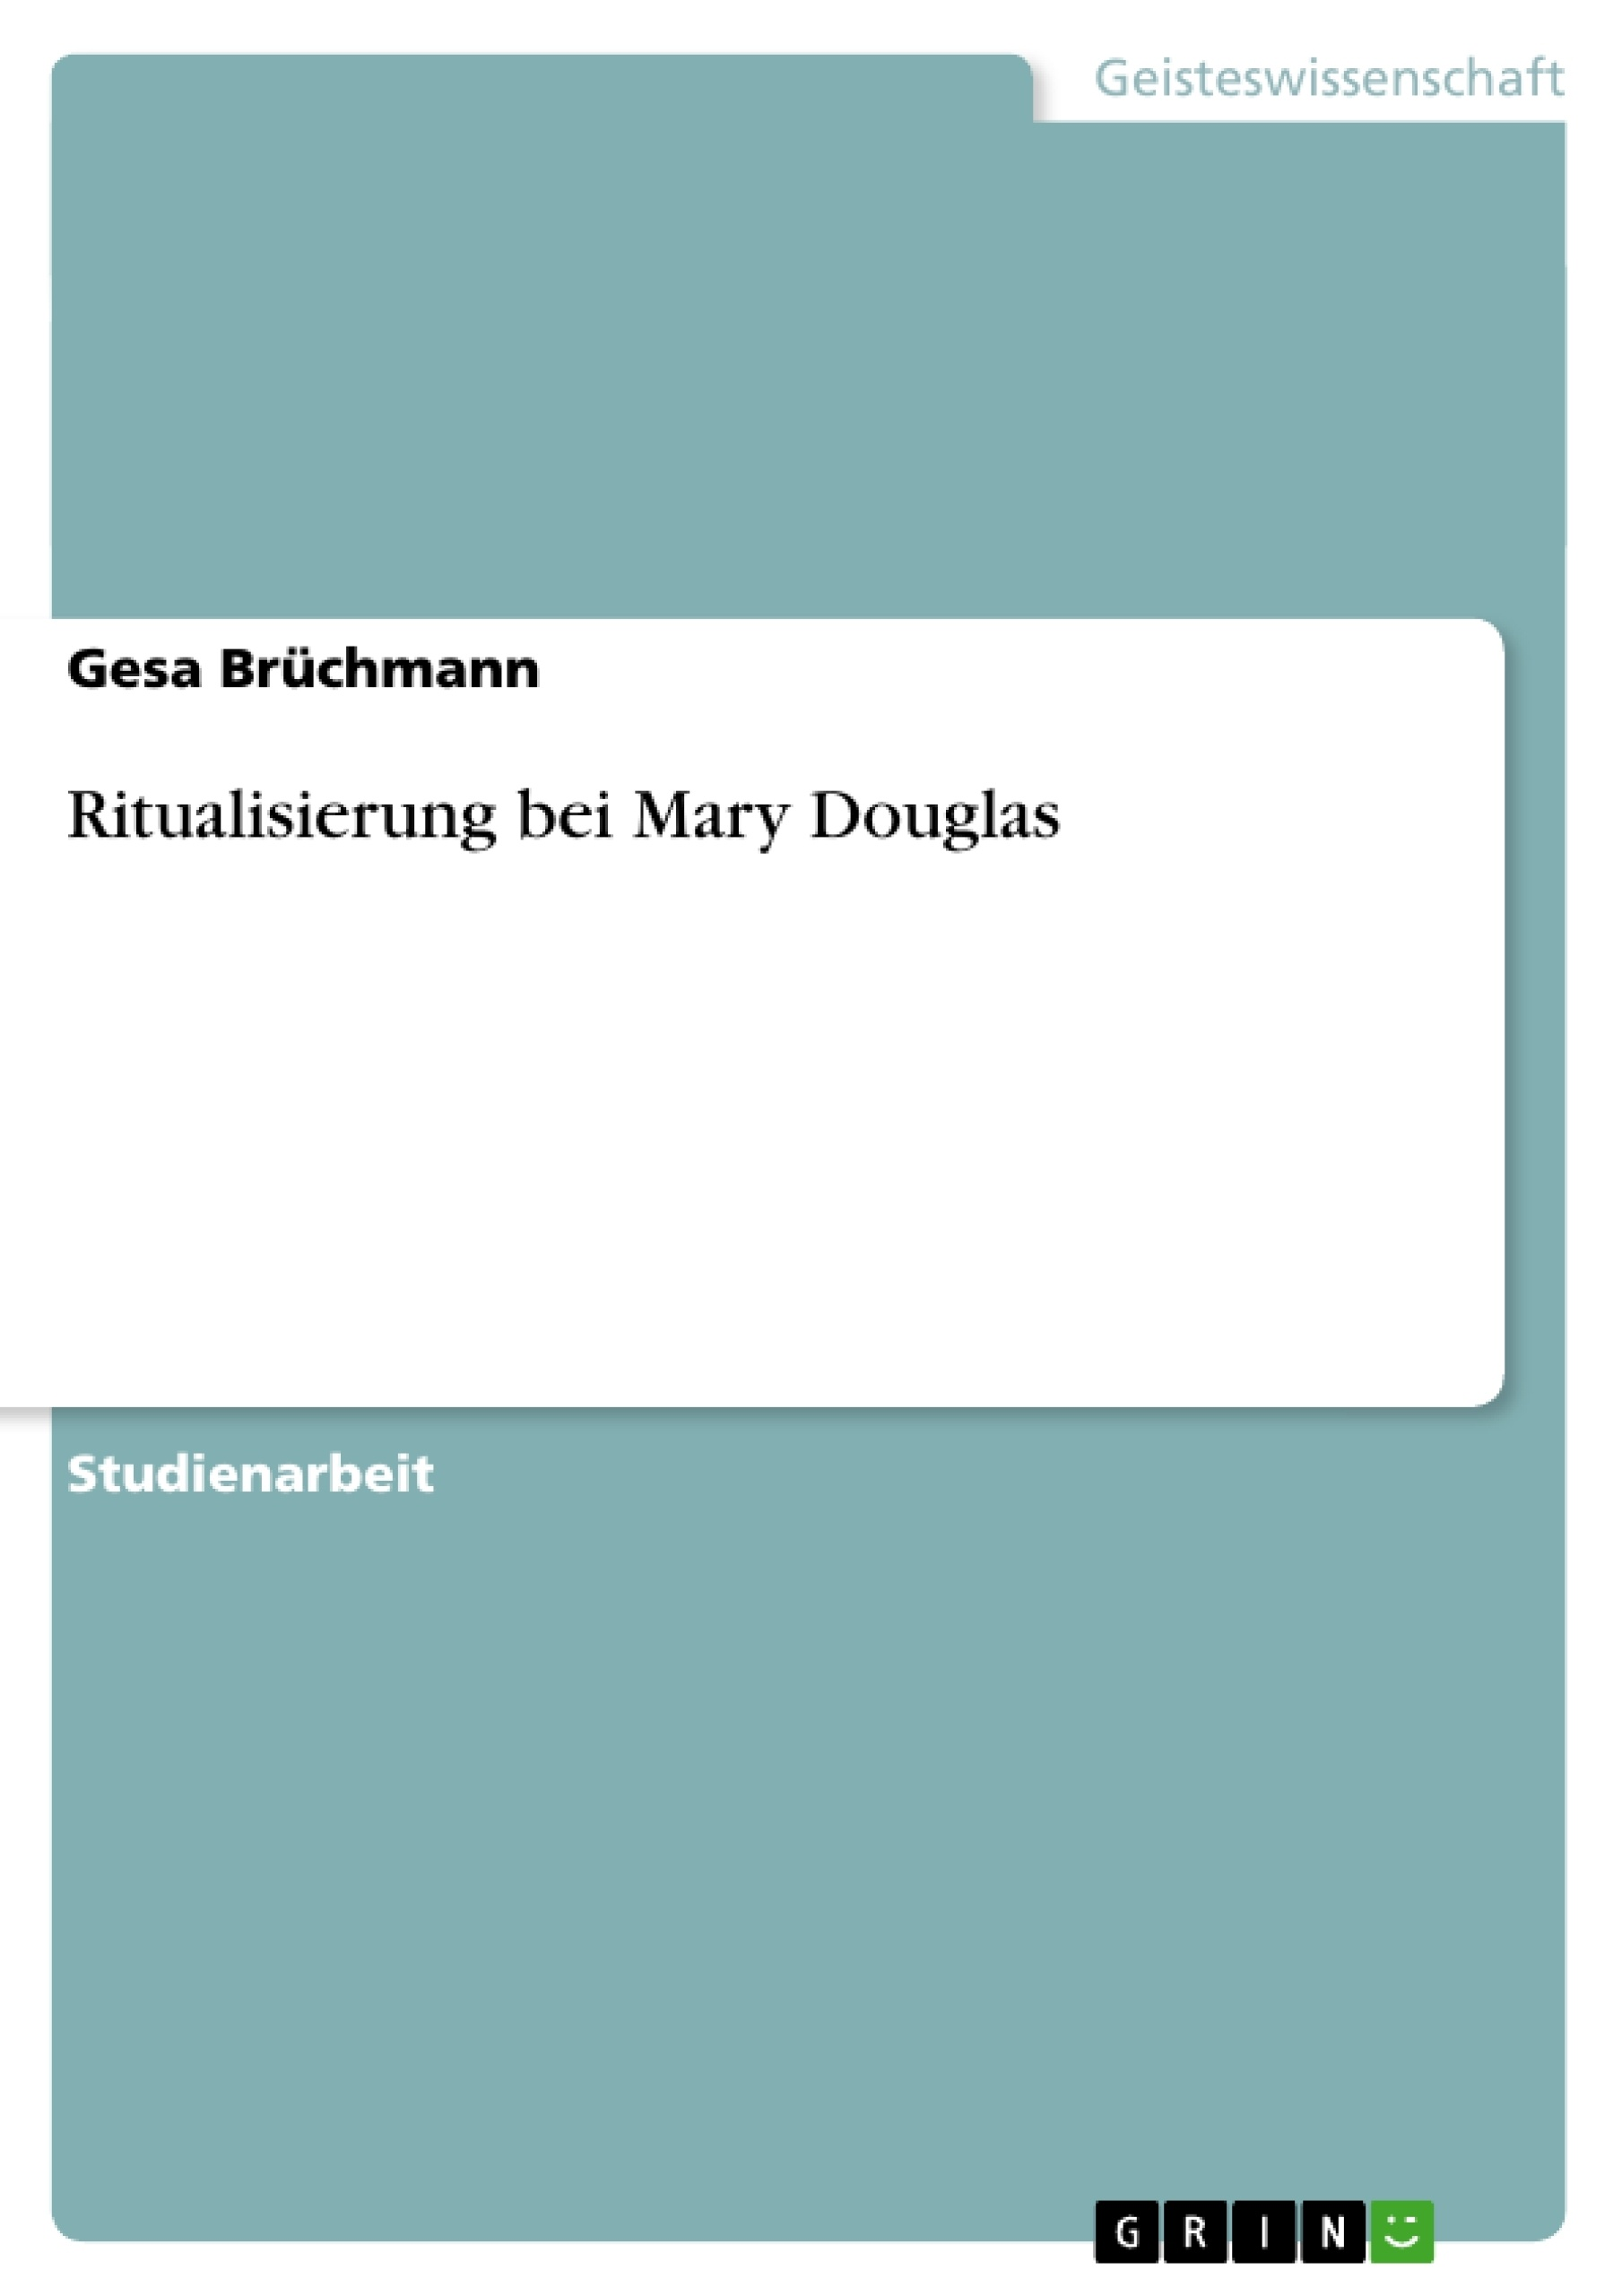 Titel: Ritualisierung bei Mary Douglas